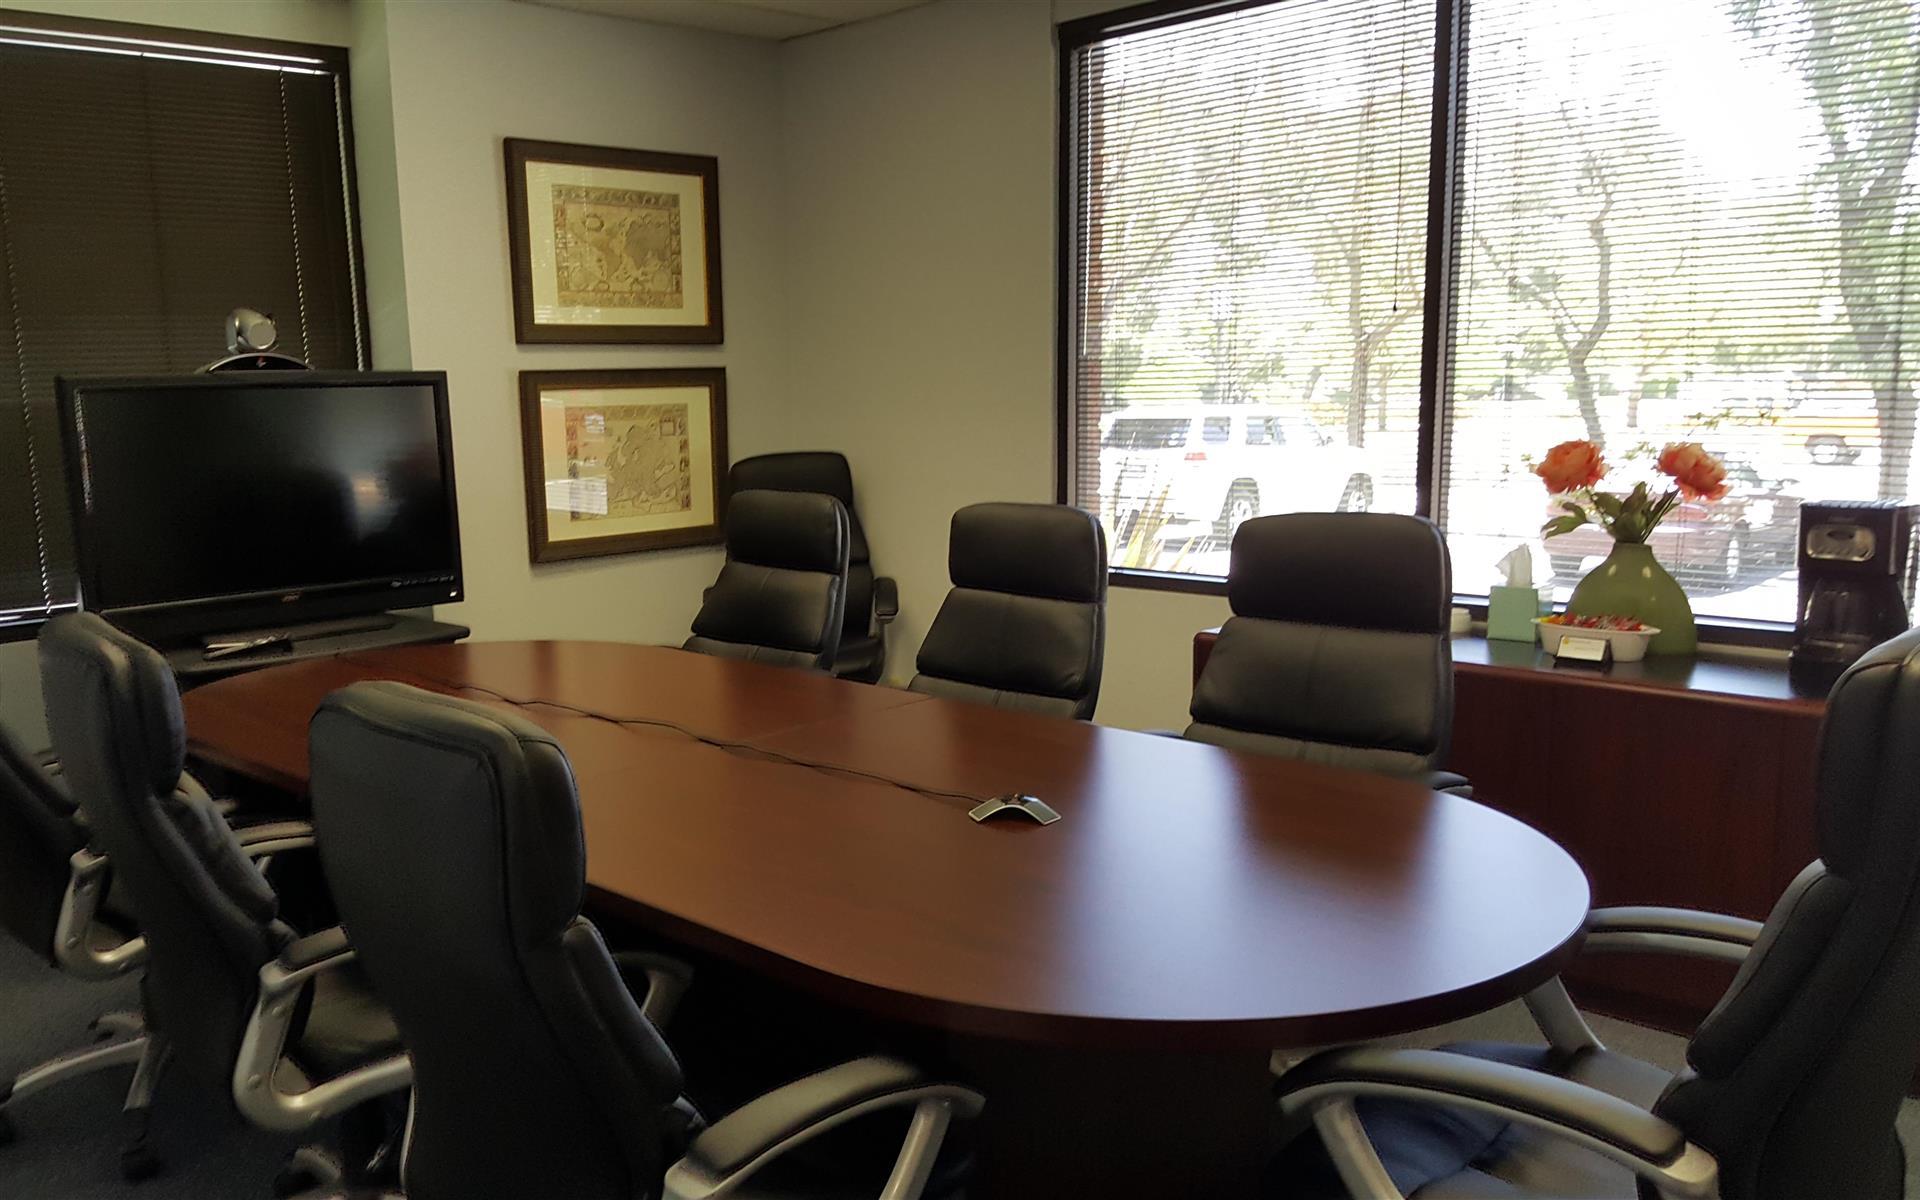 Huseby Mission Viejo - Meeting Room 1